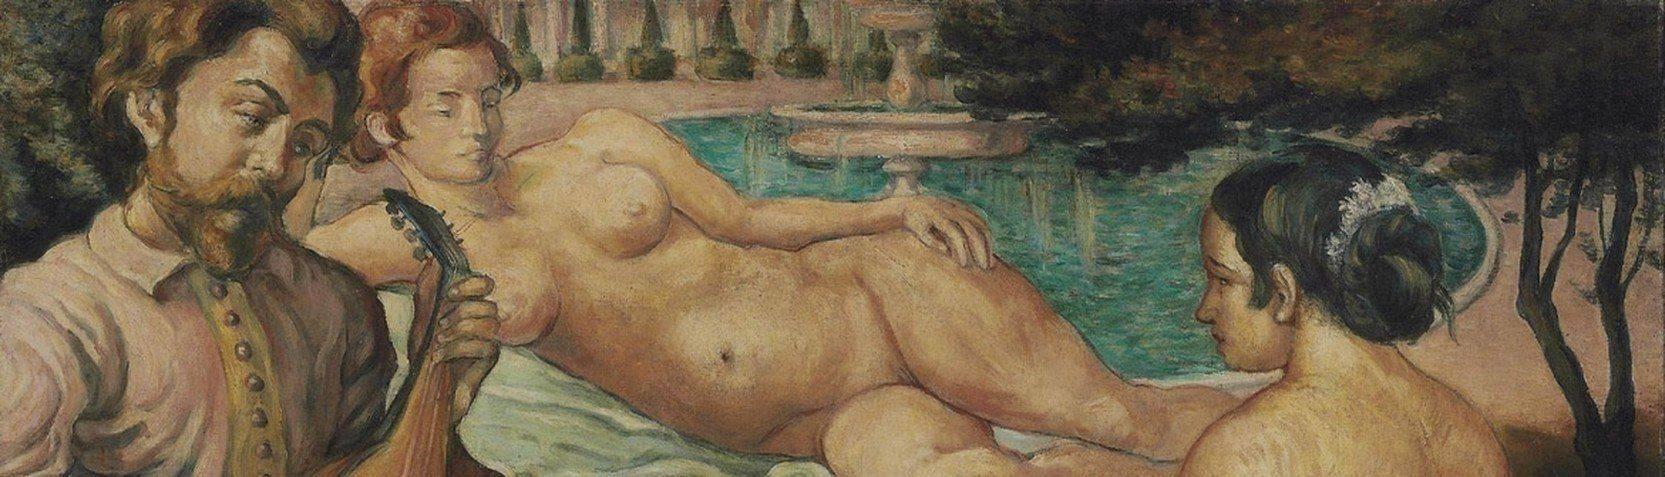 Artistes - Emile Bernard